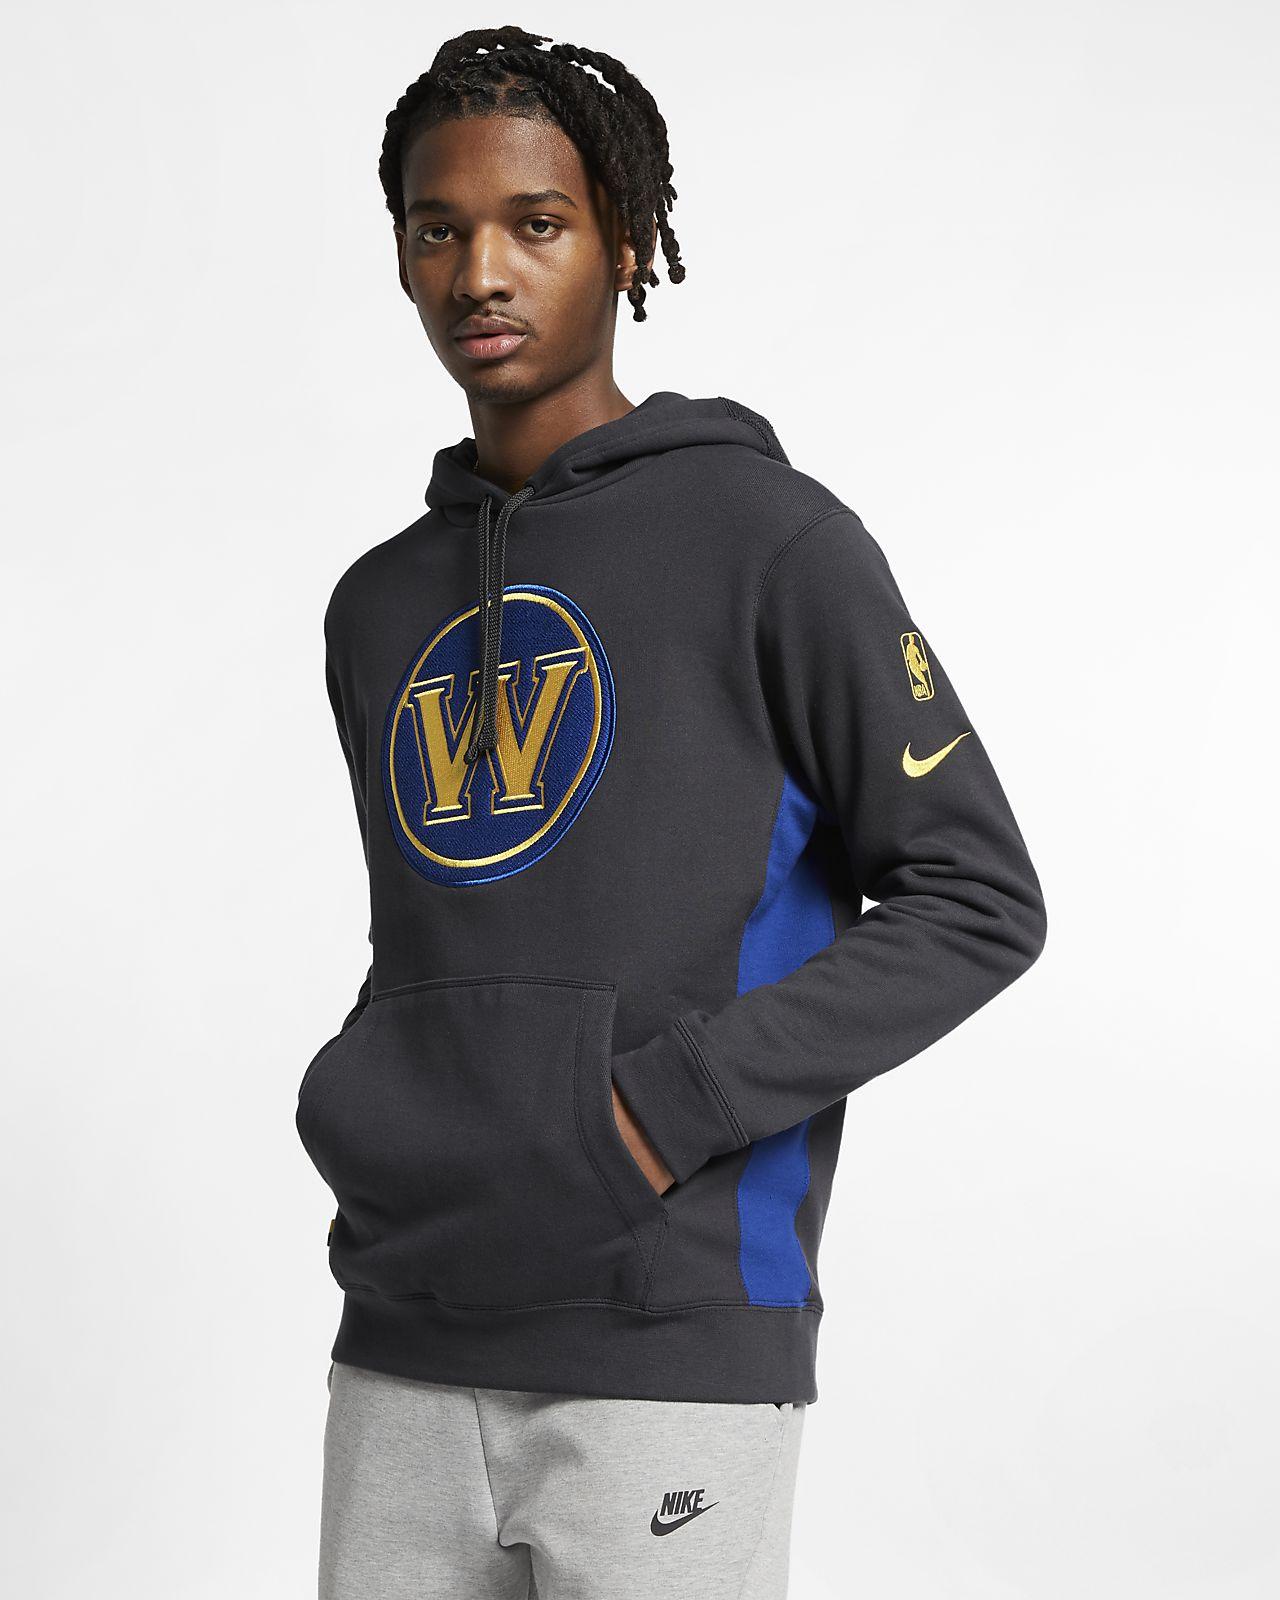 c50681d8f25 Golden State Warriors Nike Men s NBA Hoodie. Nike.com AU